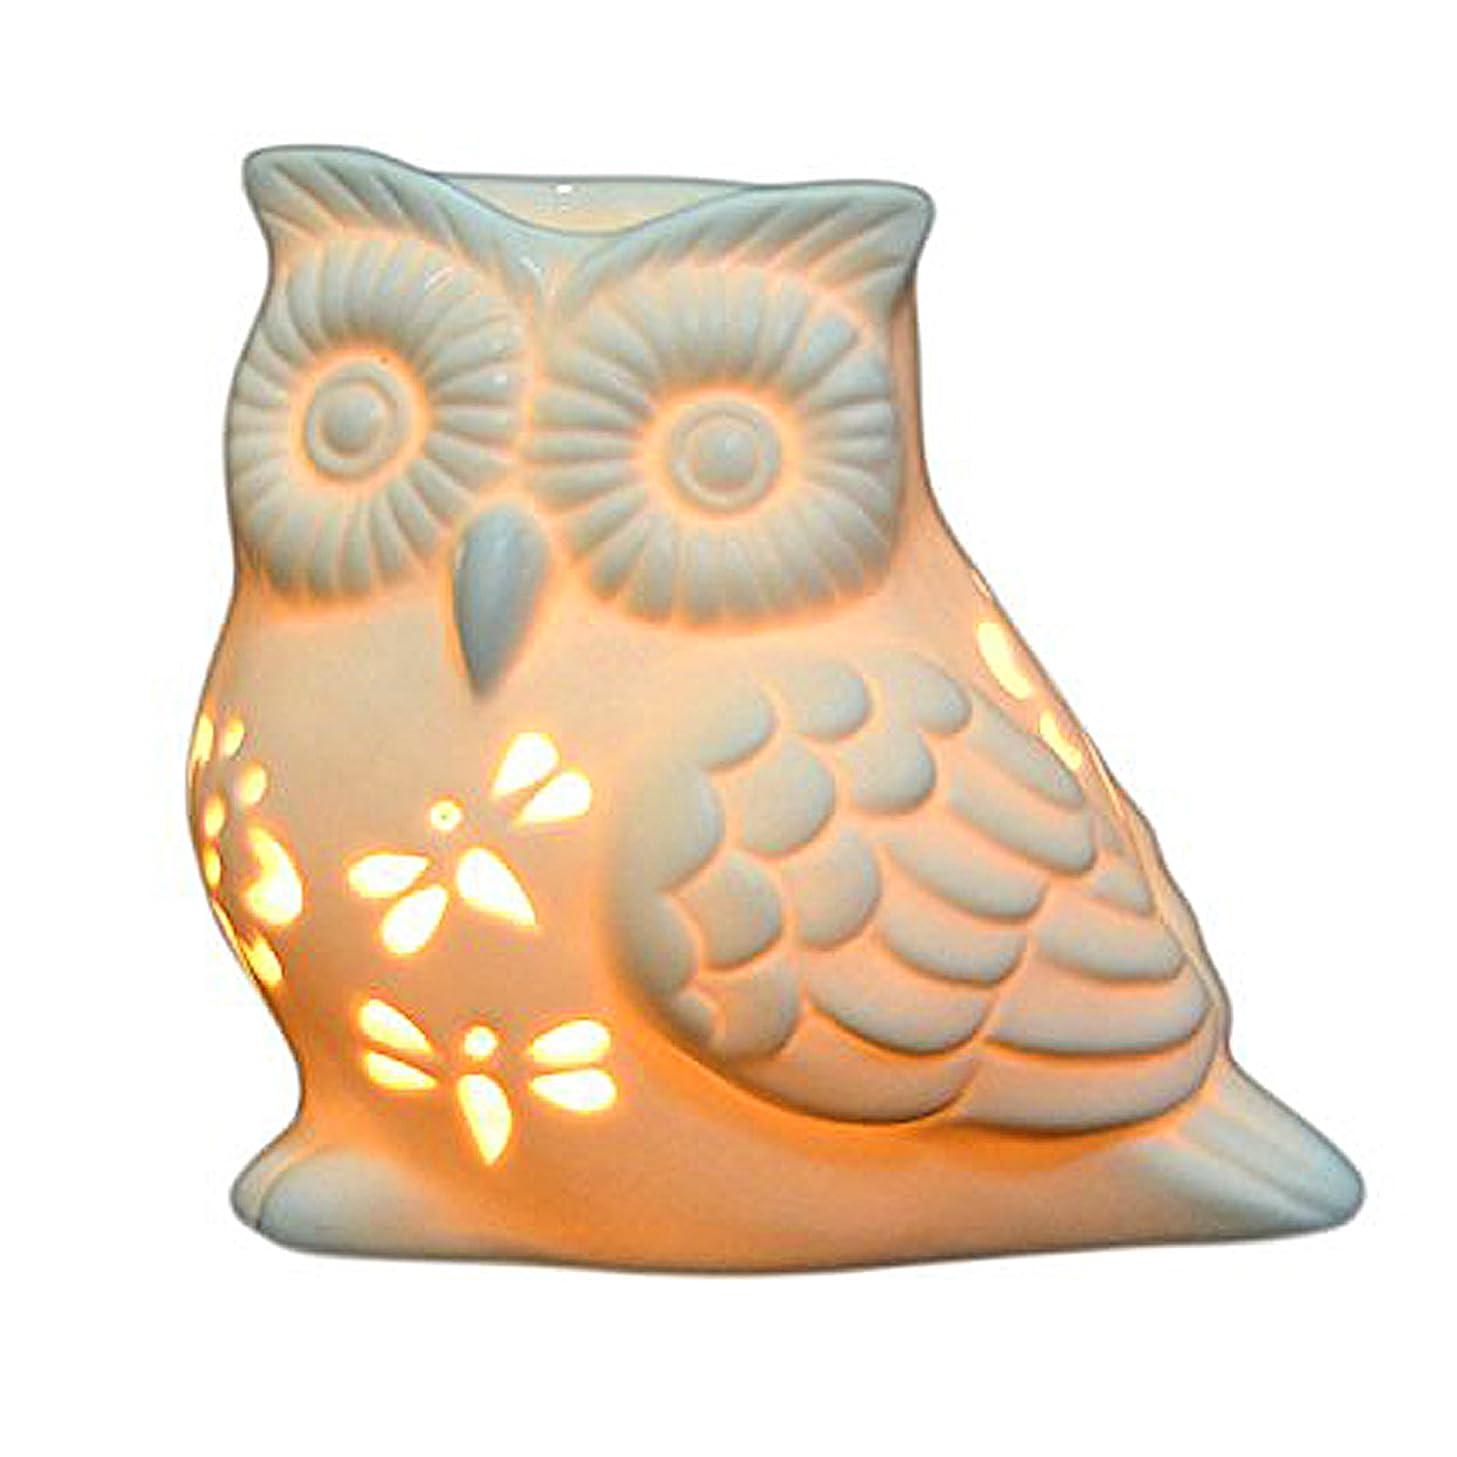 Ivenf Owl Shape Ceramic Tea Light Holder/Wax Melt Warmer, Aromatherapy Essential Oil Burner, Great Decoration for Living Room, Balcony, Patio, Porch & Garden